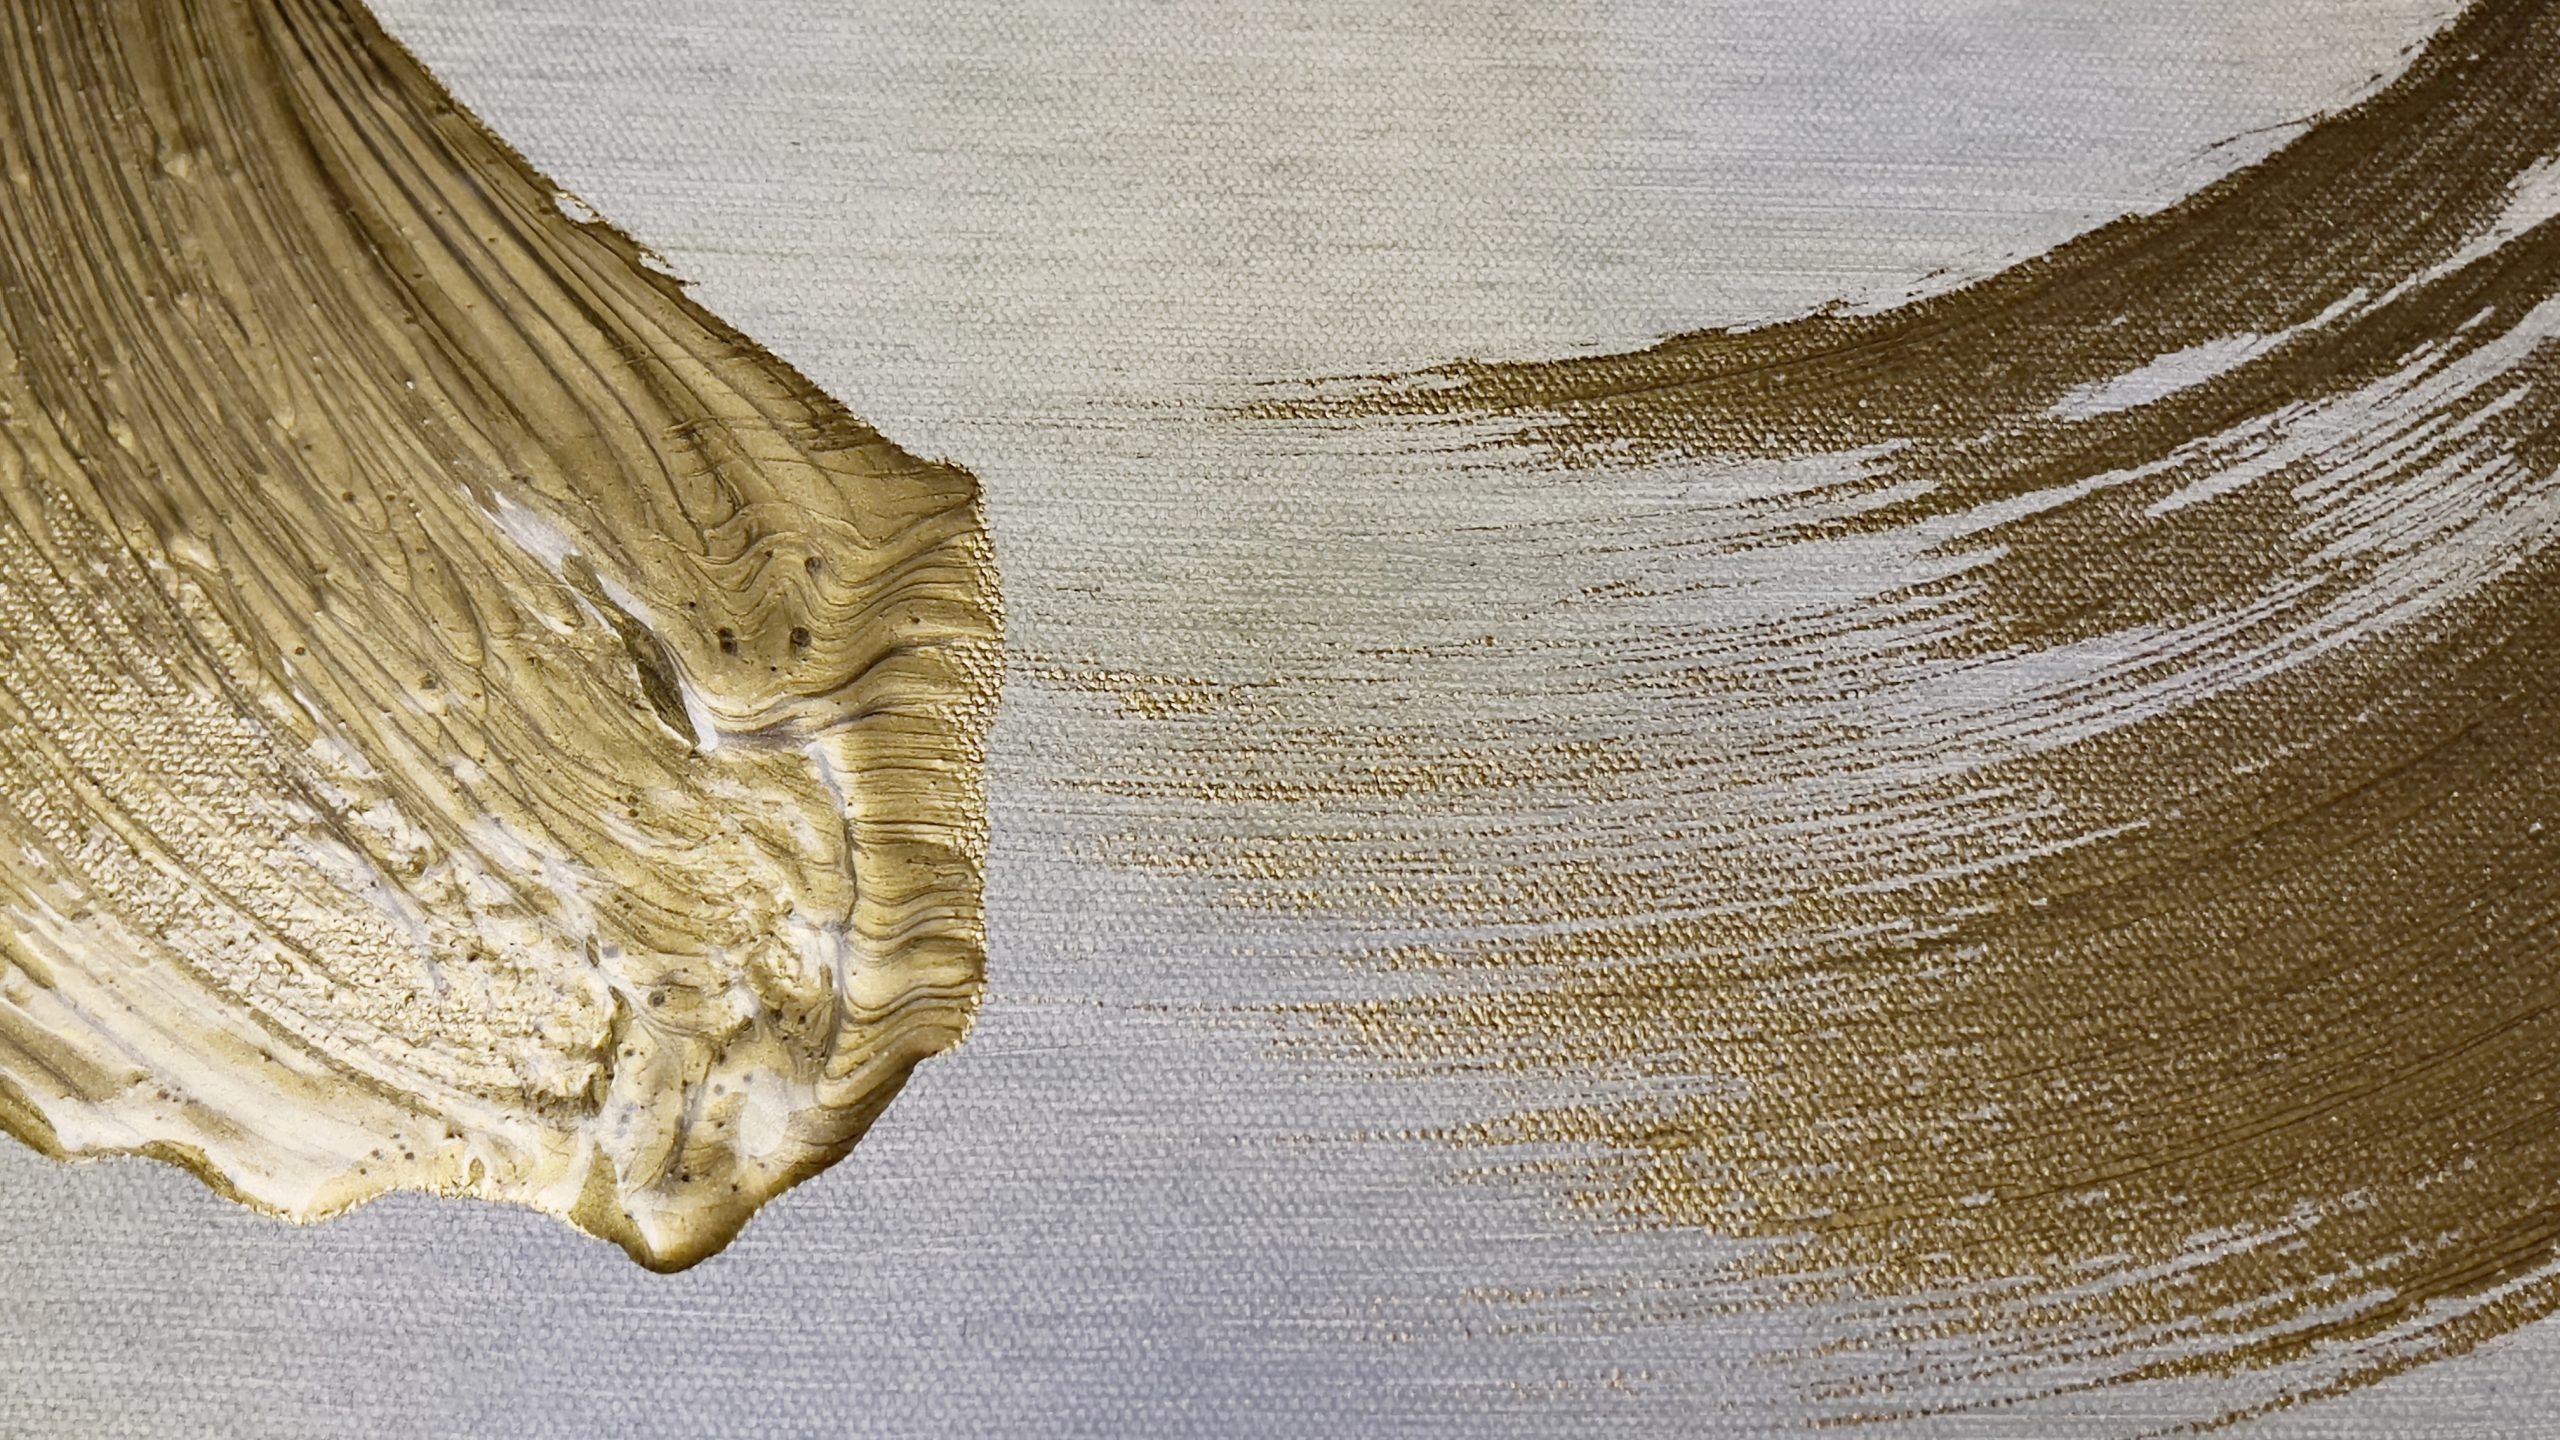 Amy Dyson, artist, art historian, prehistorian, prehistory, One Zen Place, Art Gallery, Vero Beach, Florida, Lascaux, Enso, Single-brushstroke, paintings, sculpture, works-on-paper, digital media, photography, amydyson